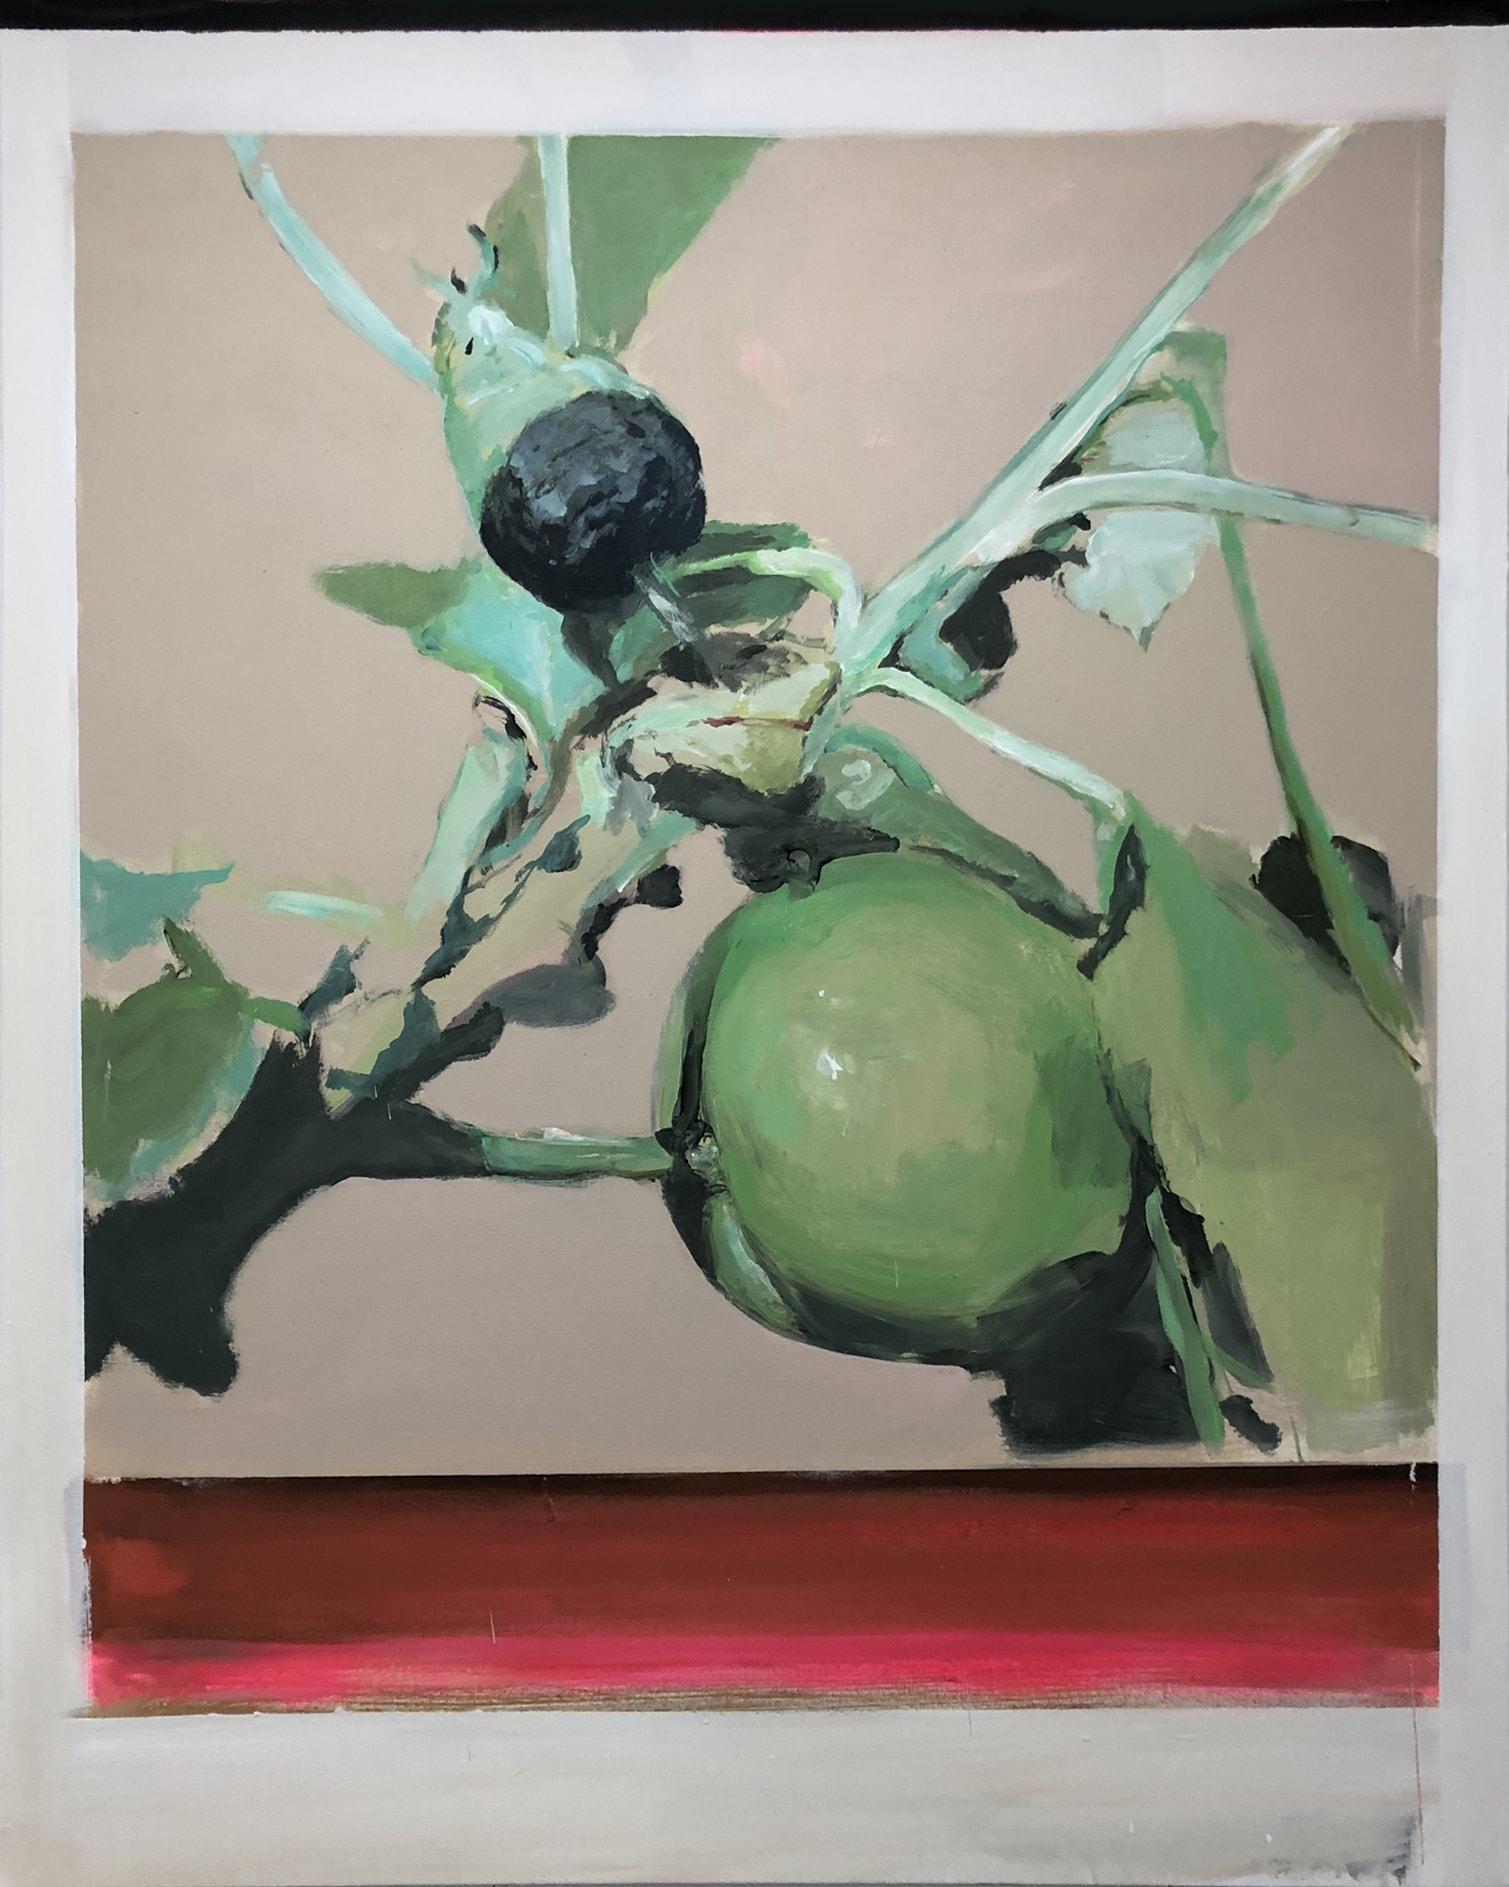 Michael_Harnish_60 x 48 inches_oil